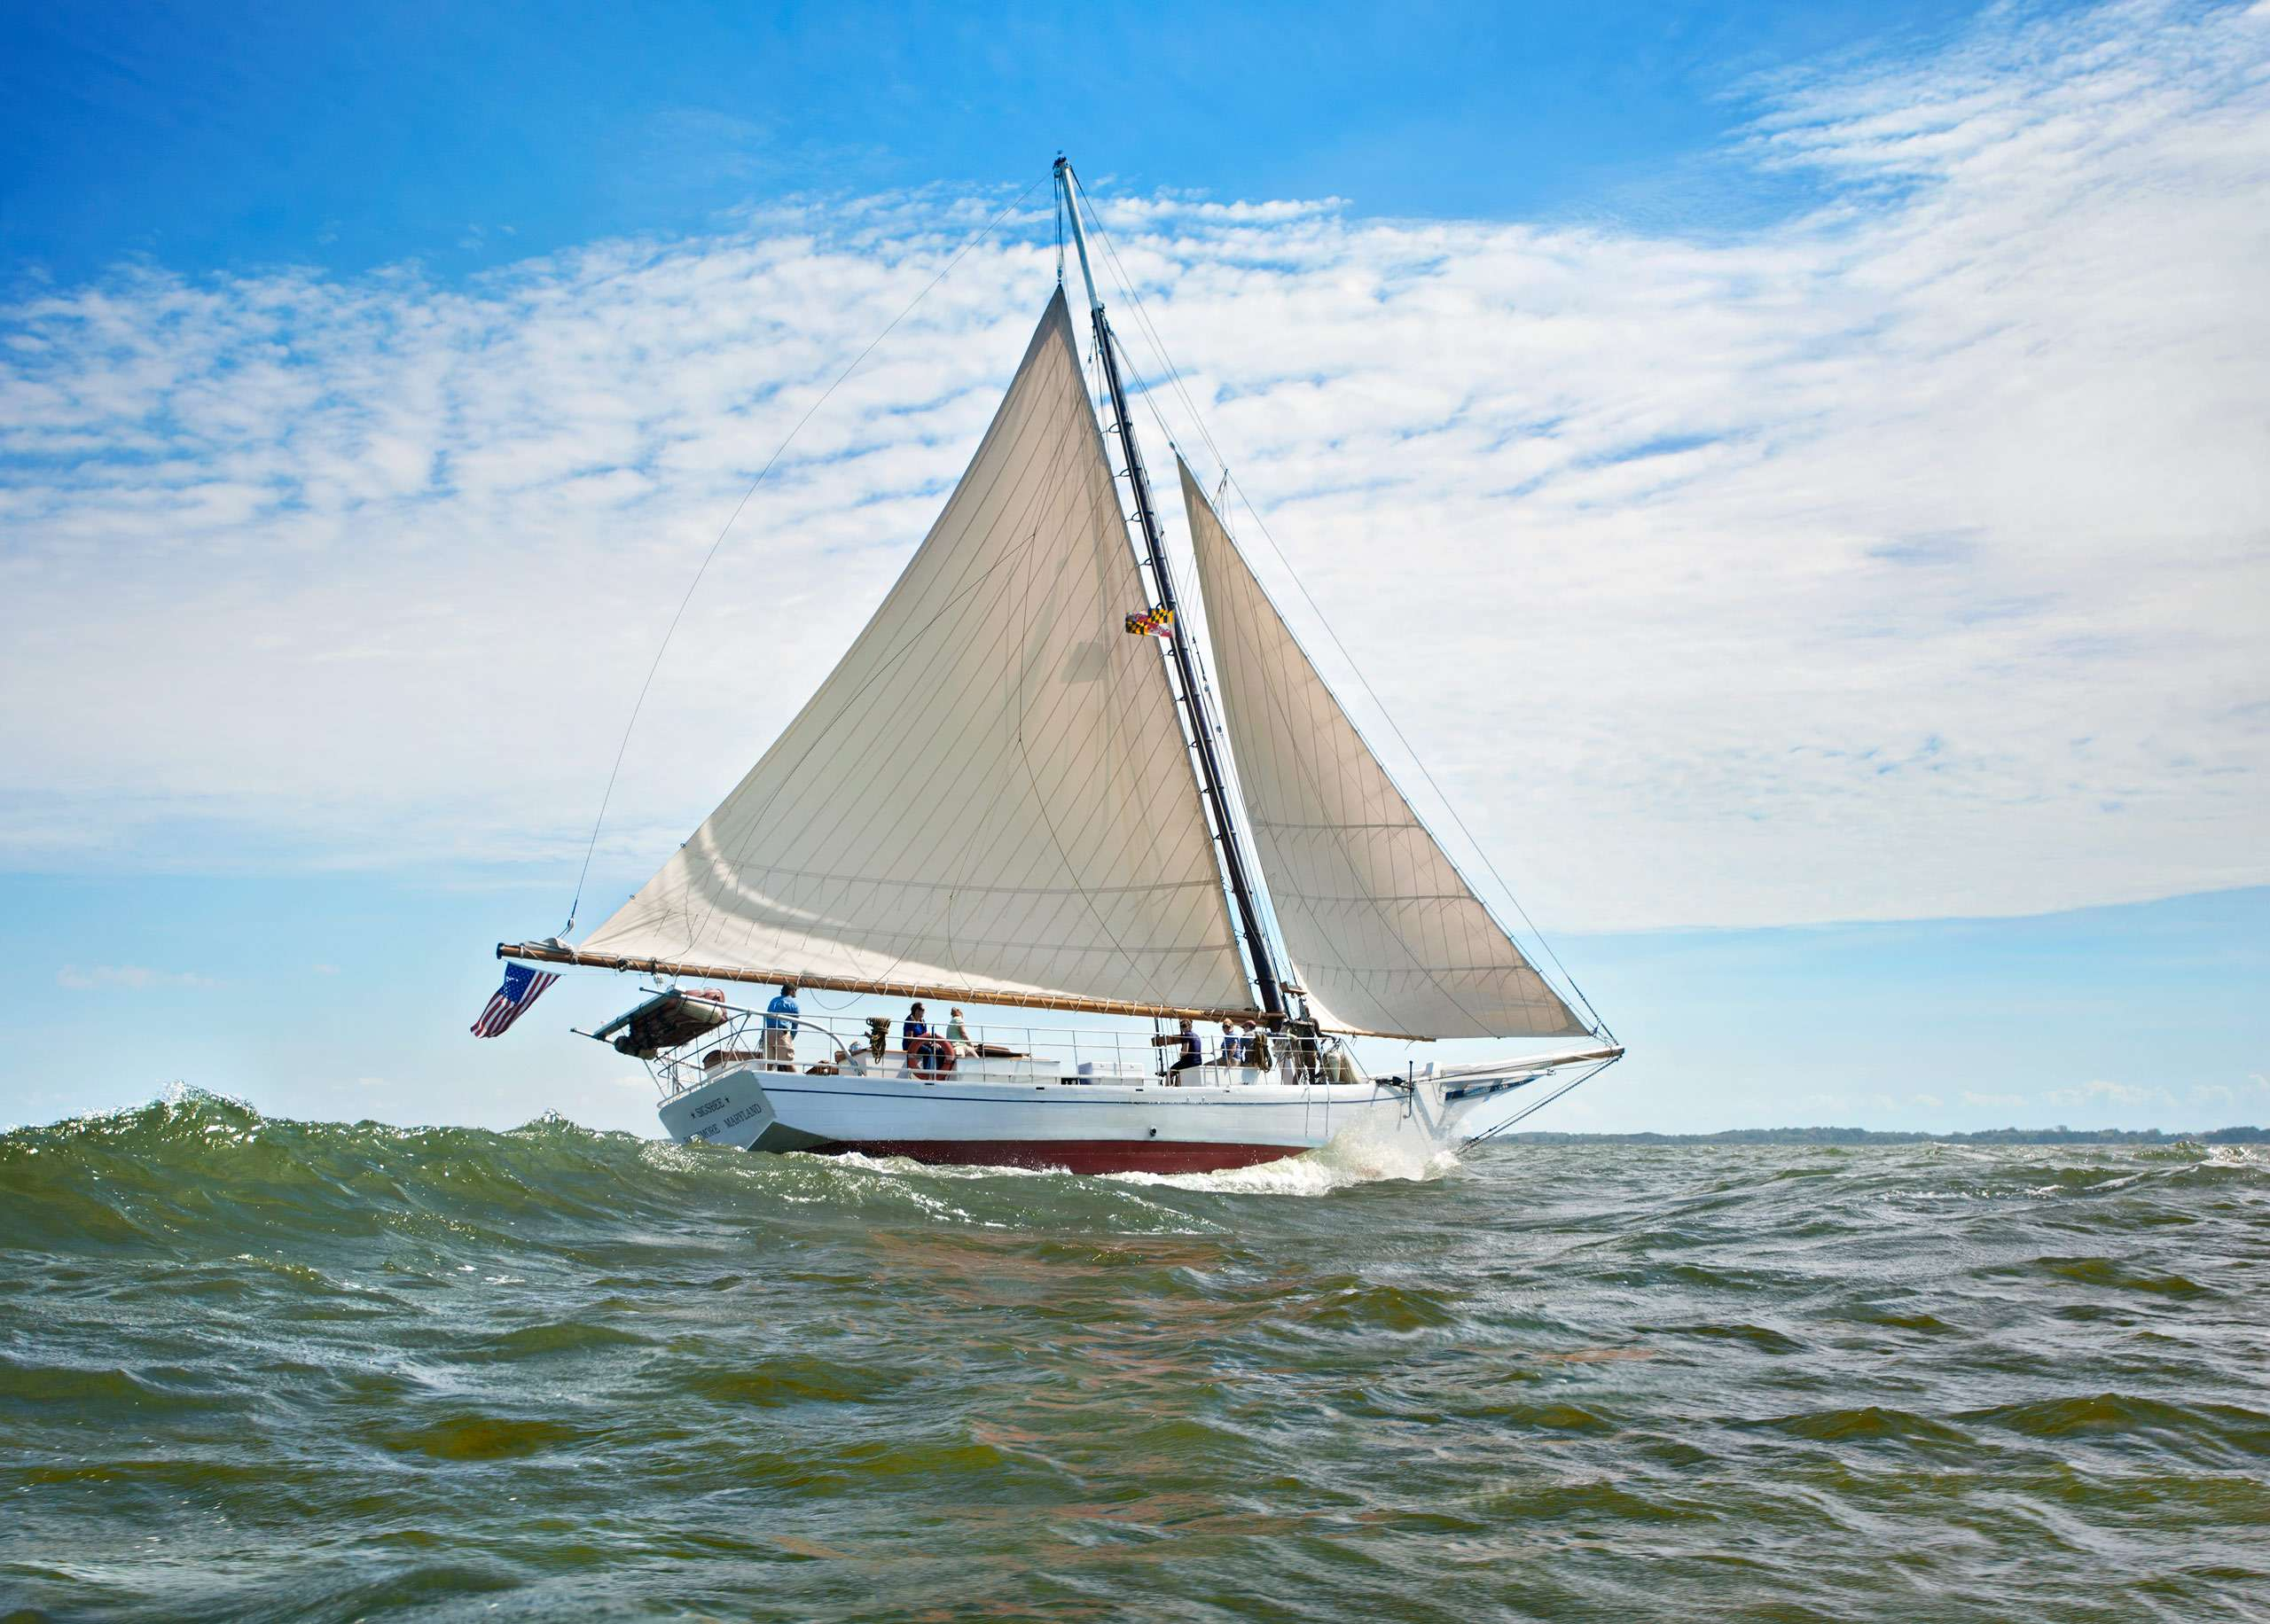 PORTFOLIO - Sailing - Skipjacks #7   PCG657